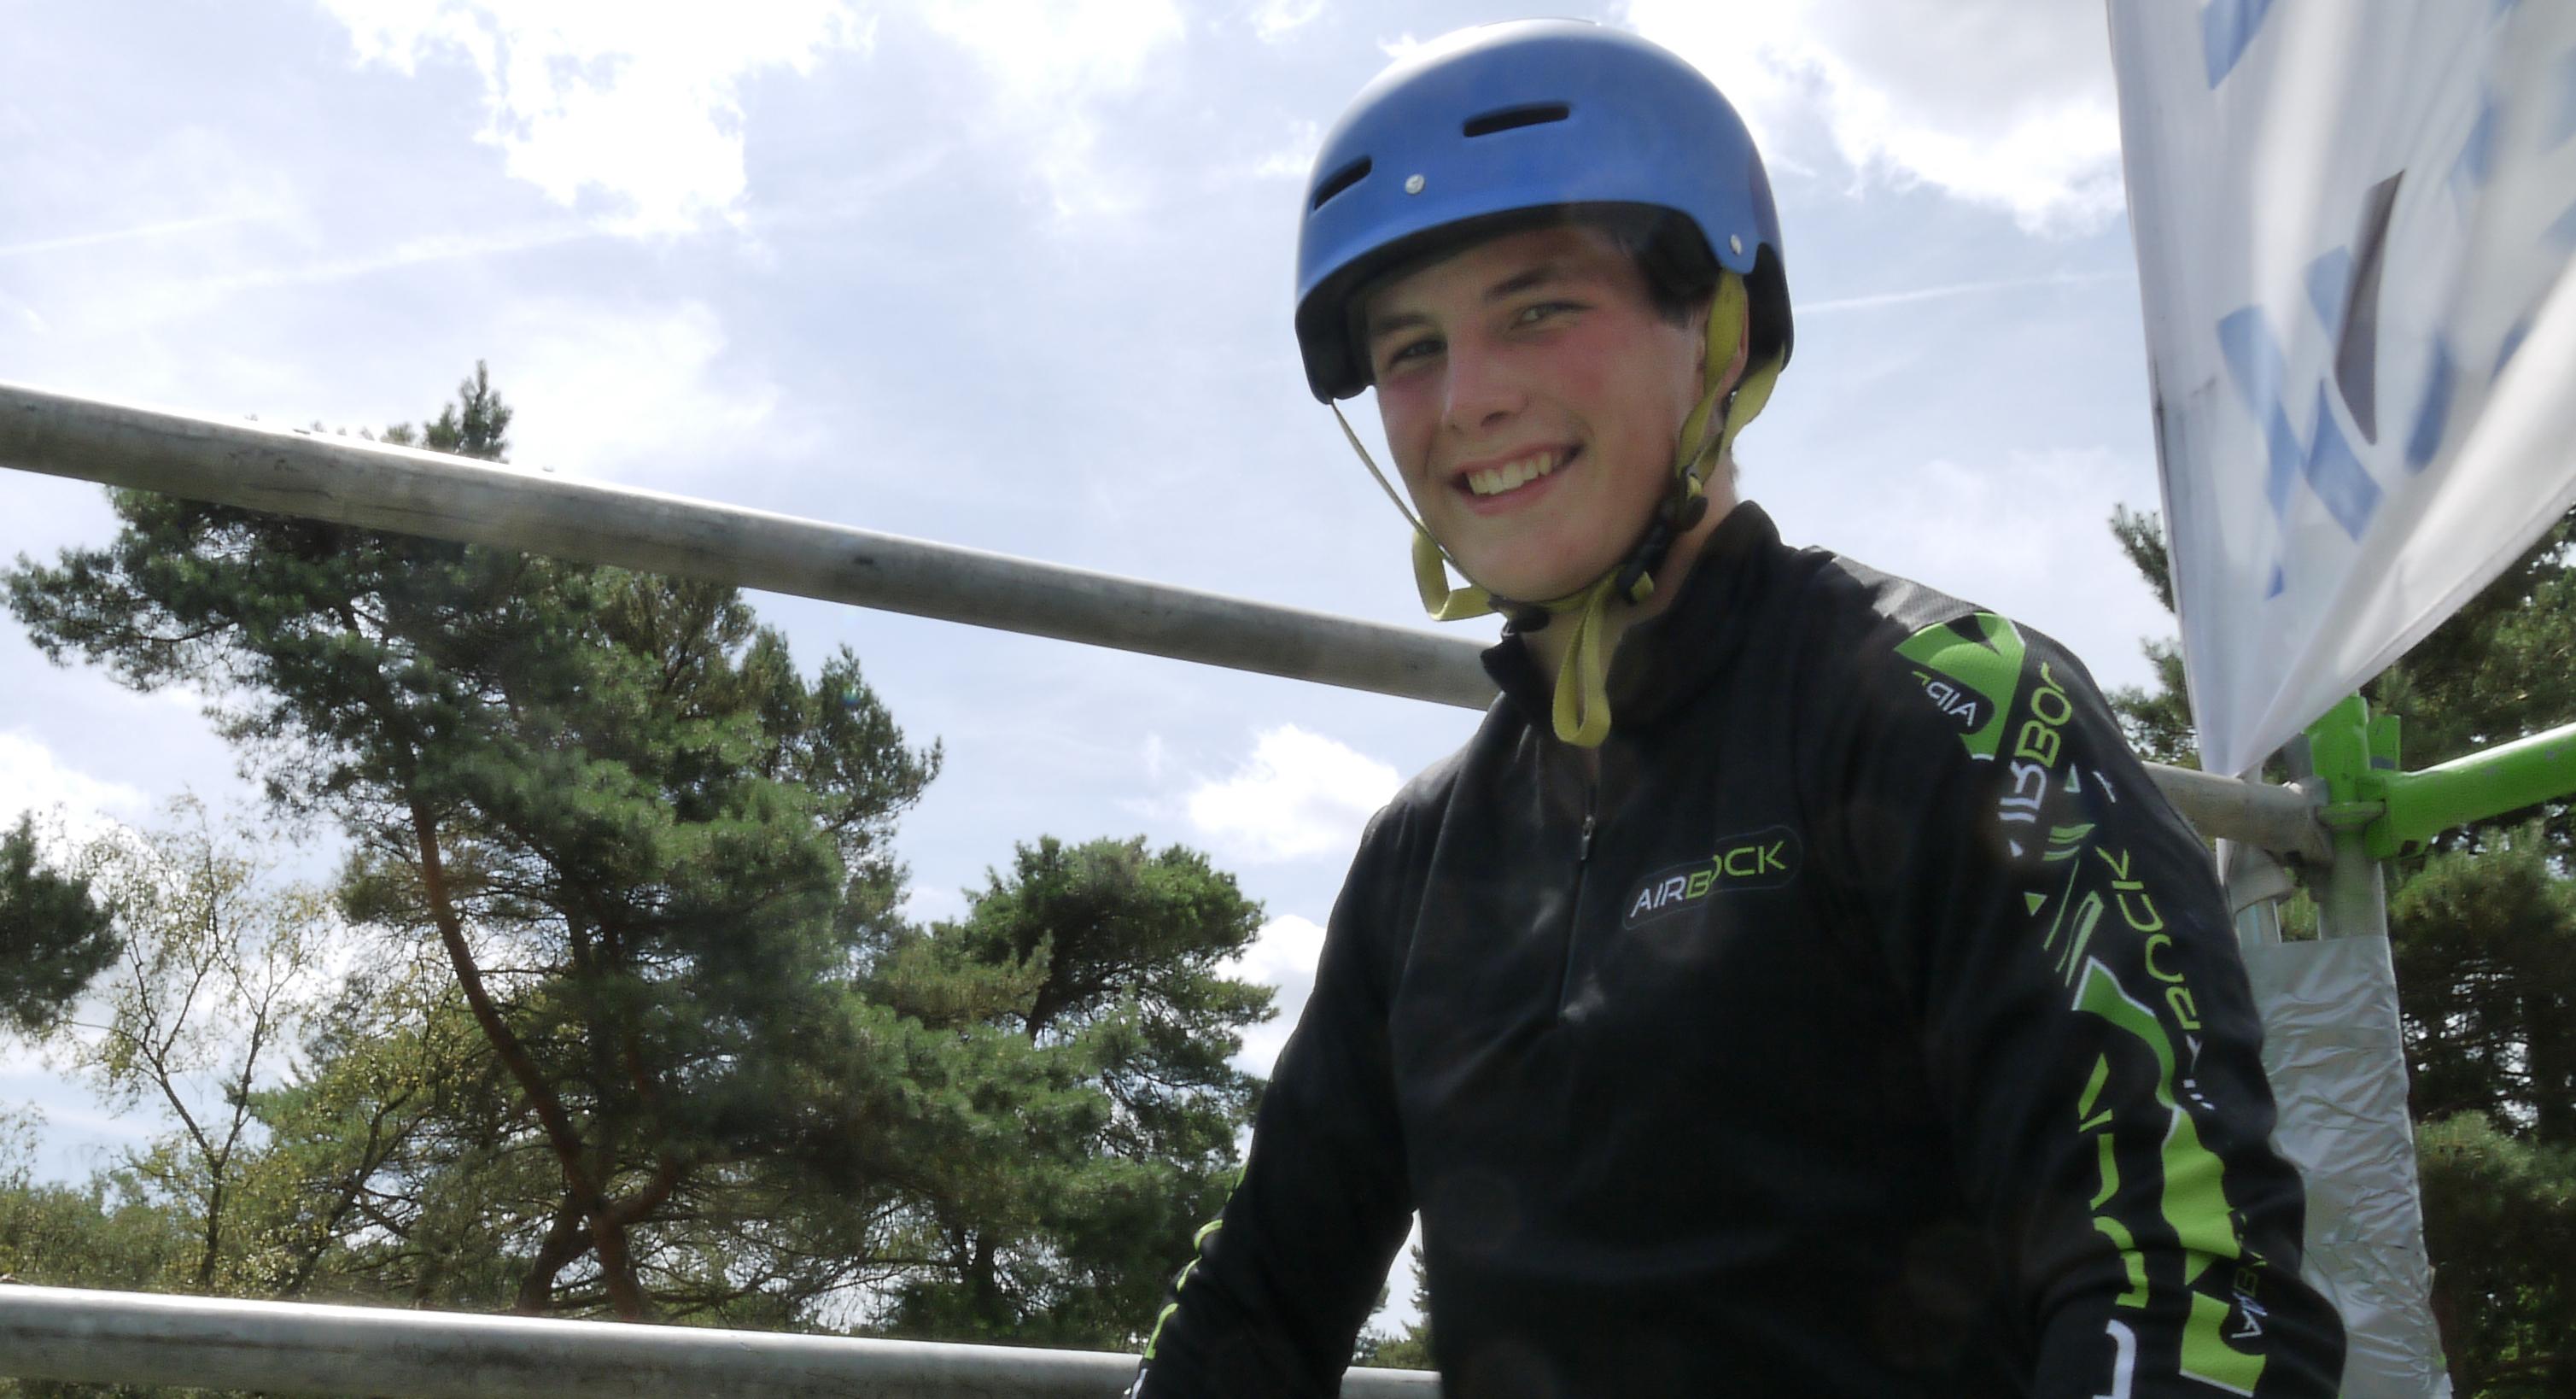 Jasson AirBock Rider